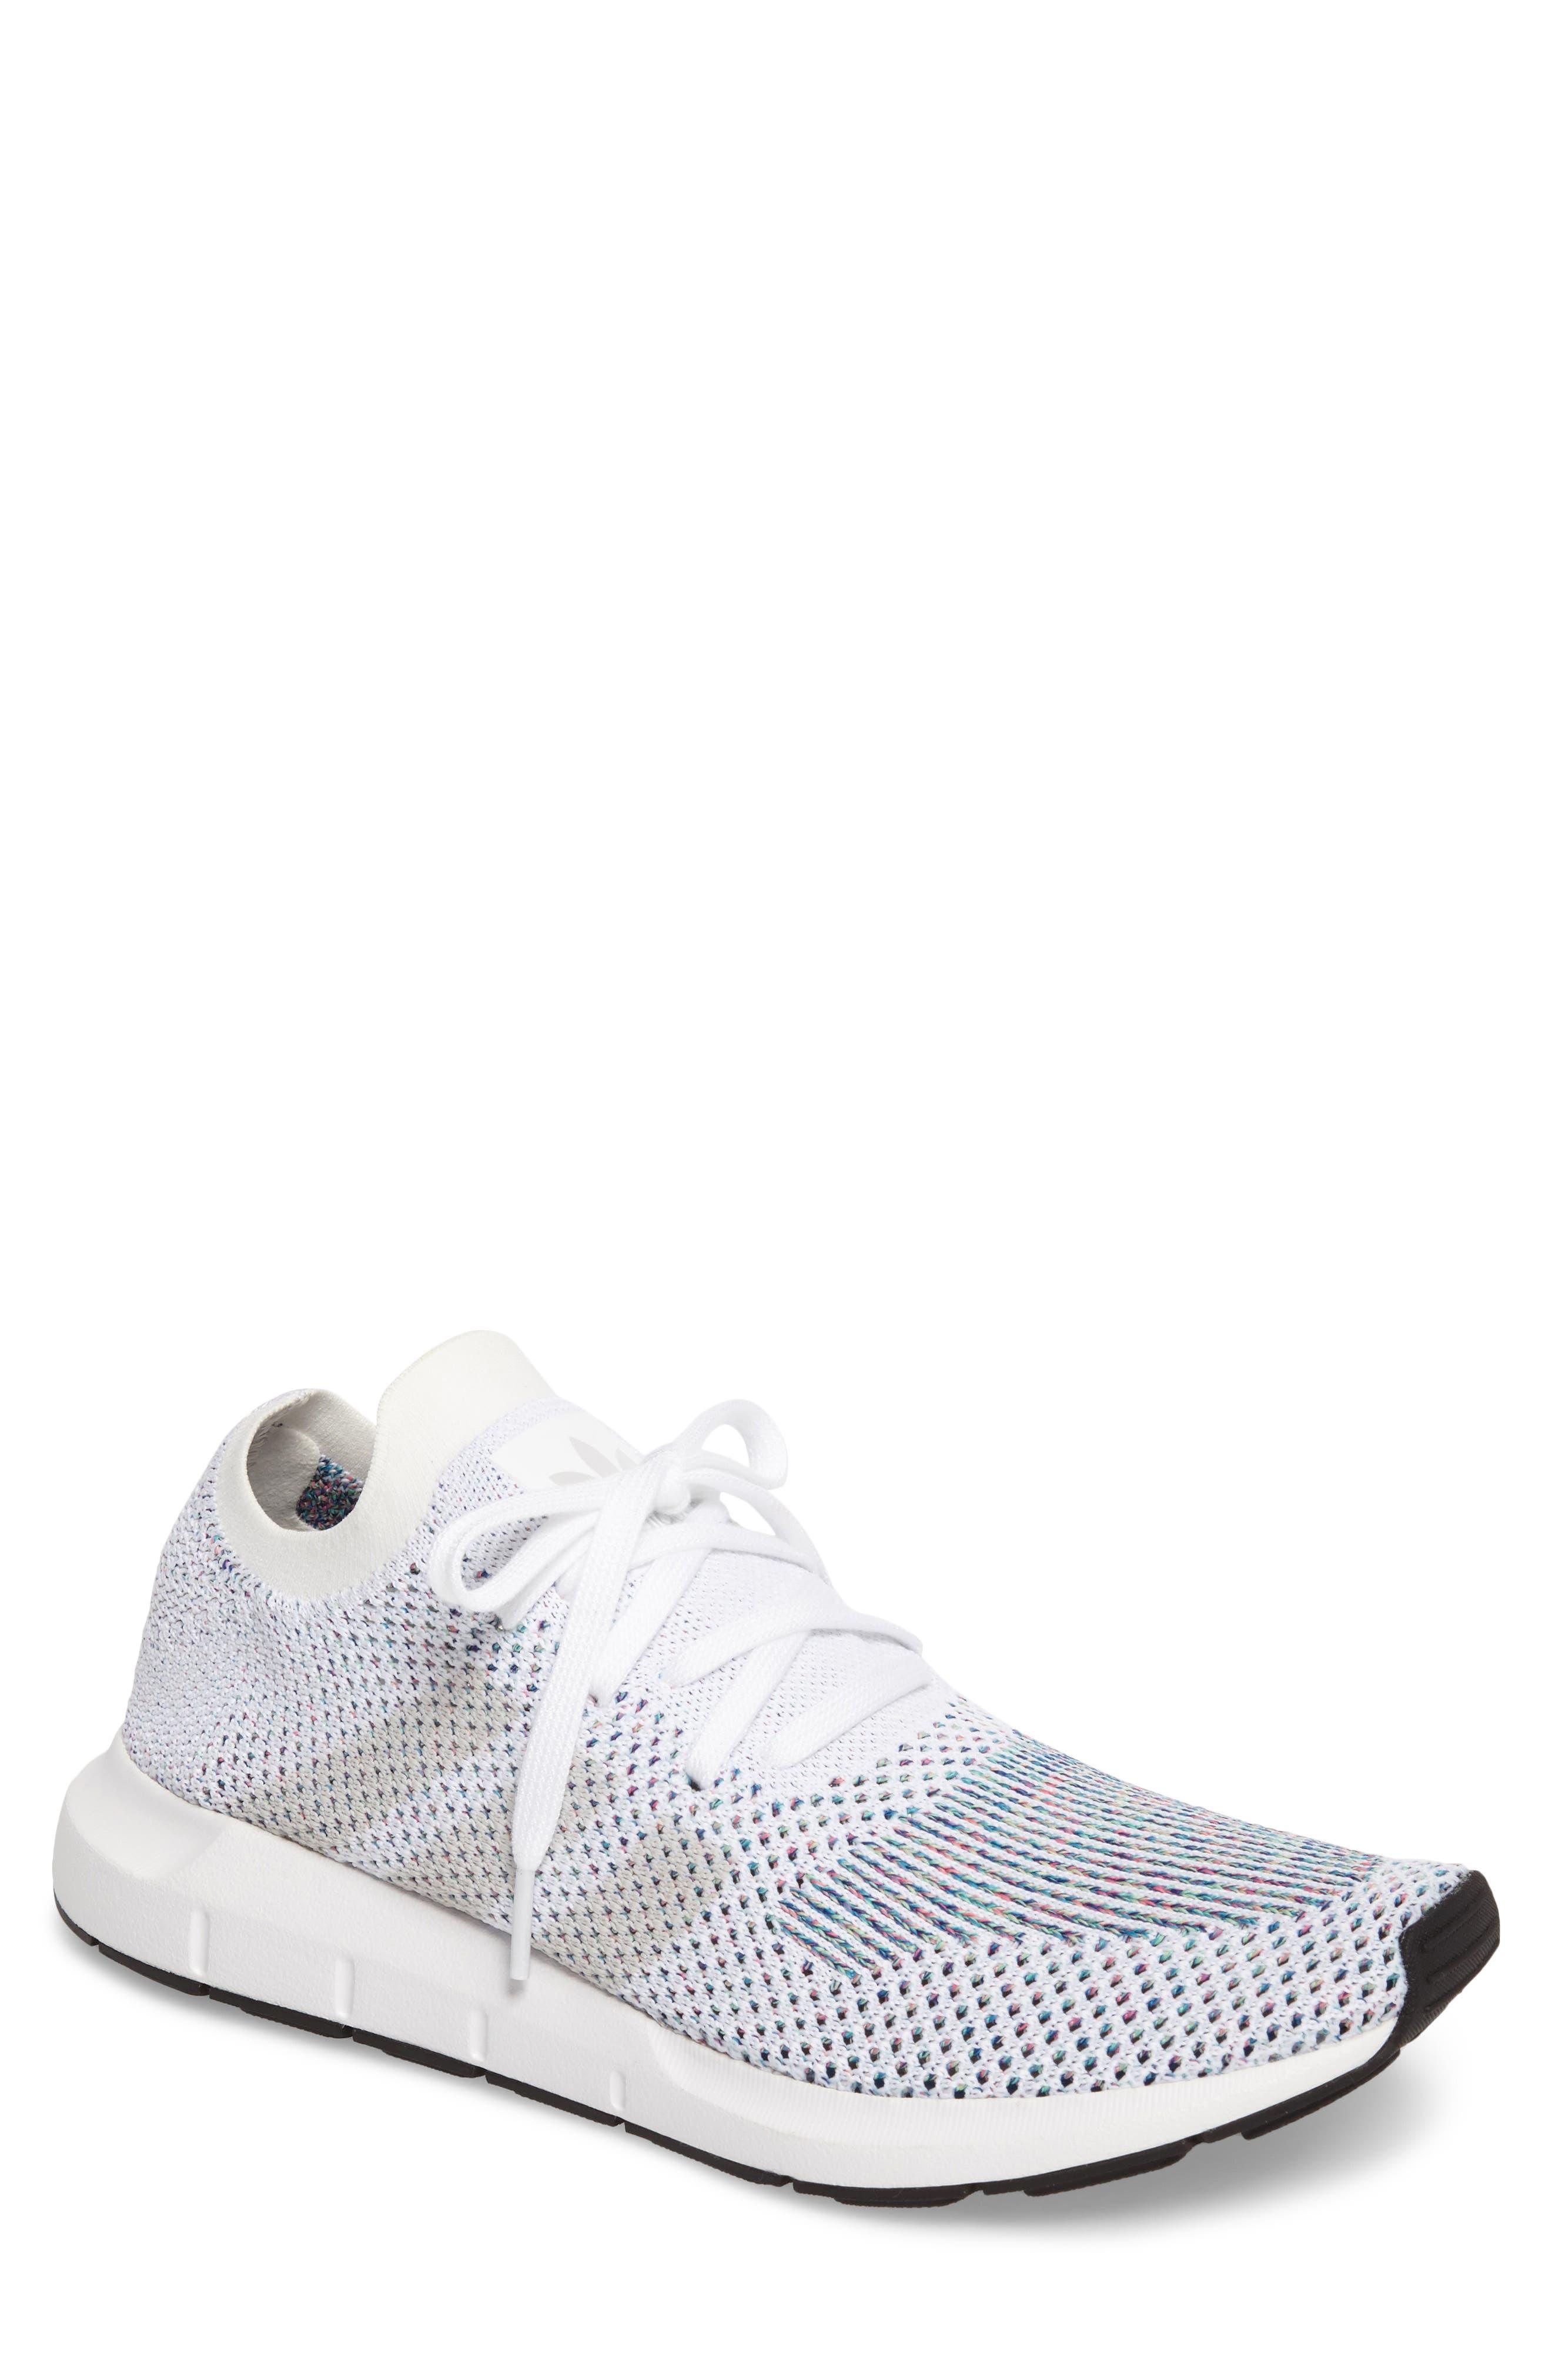 adidas Swift Run Primeknit Training Shoe (Men)